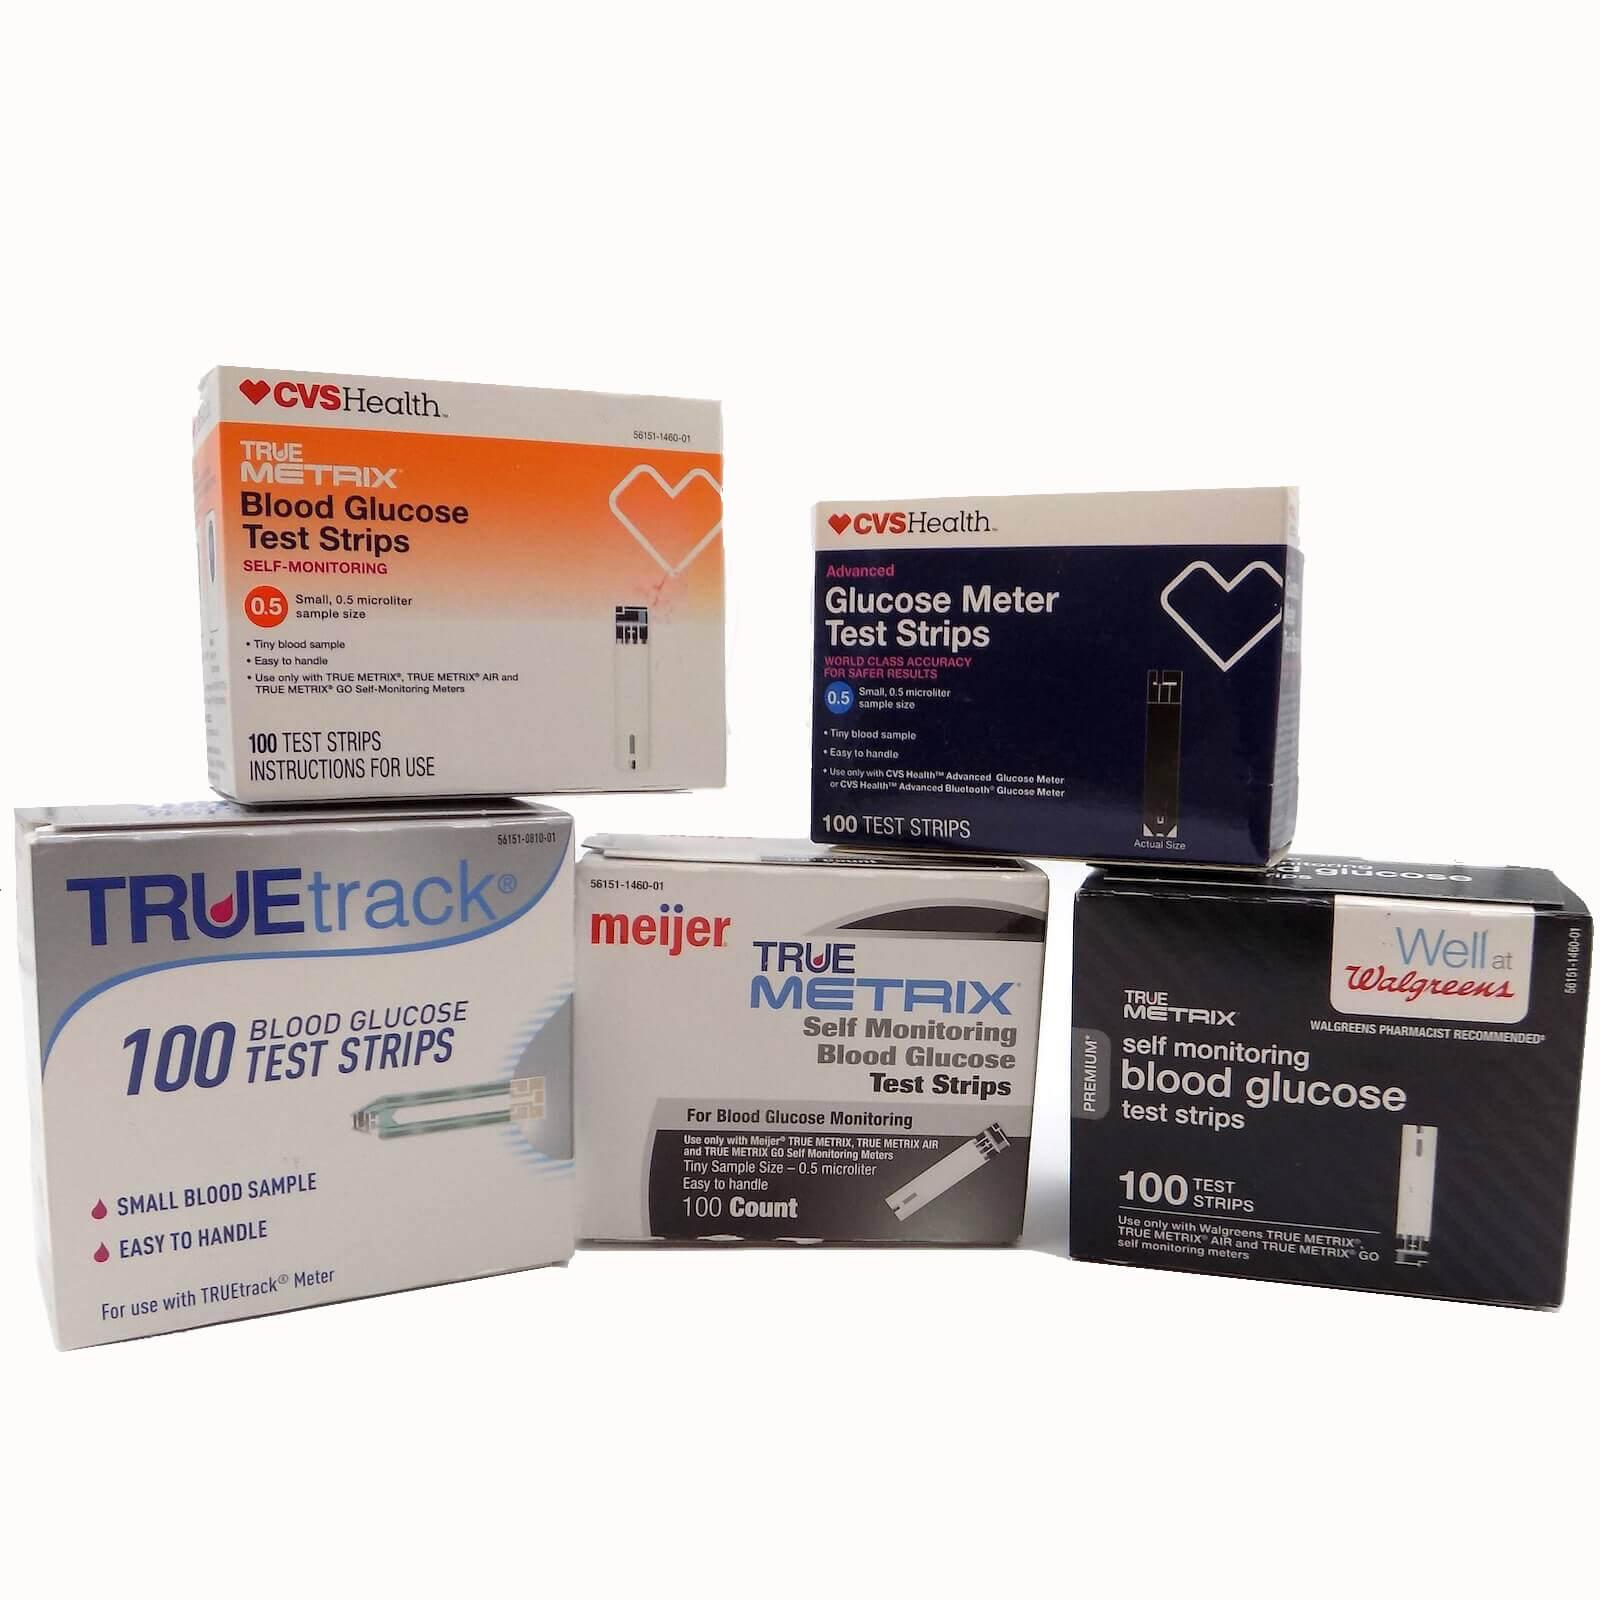 True Metrix, True Test, Advocate, Glucocard, Embrace, Inform II